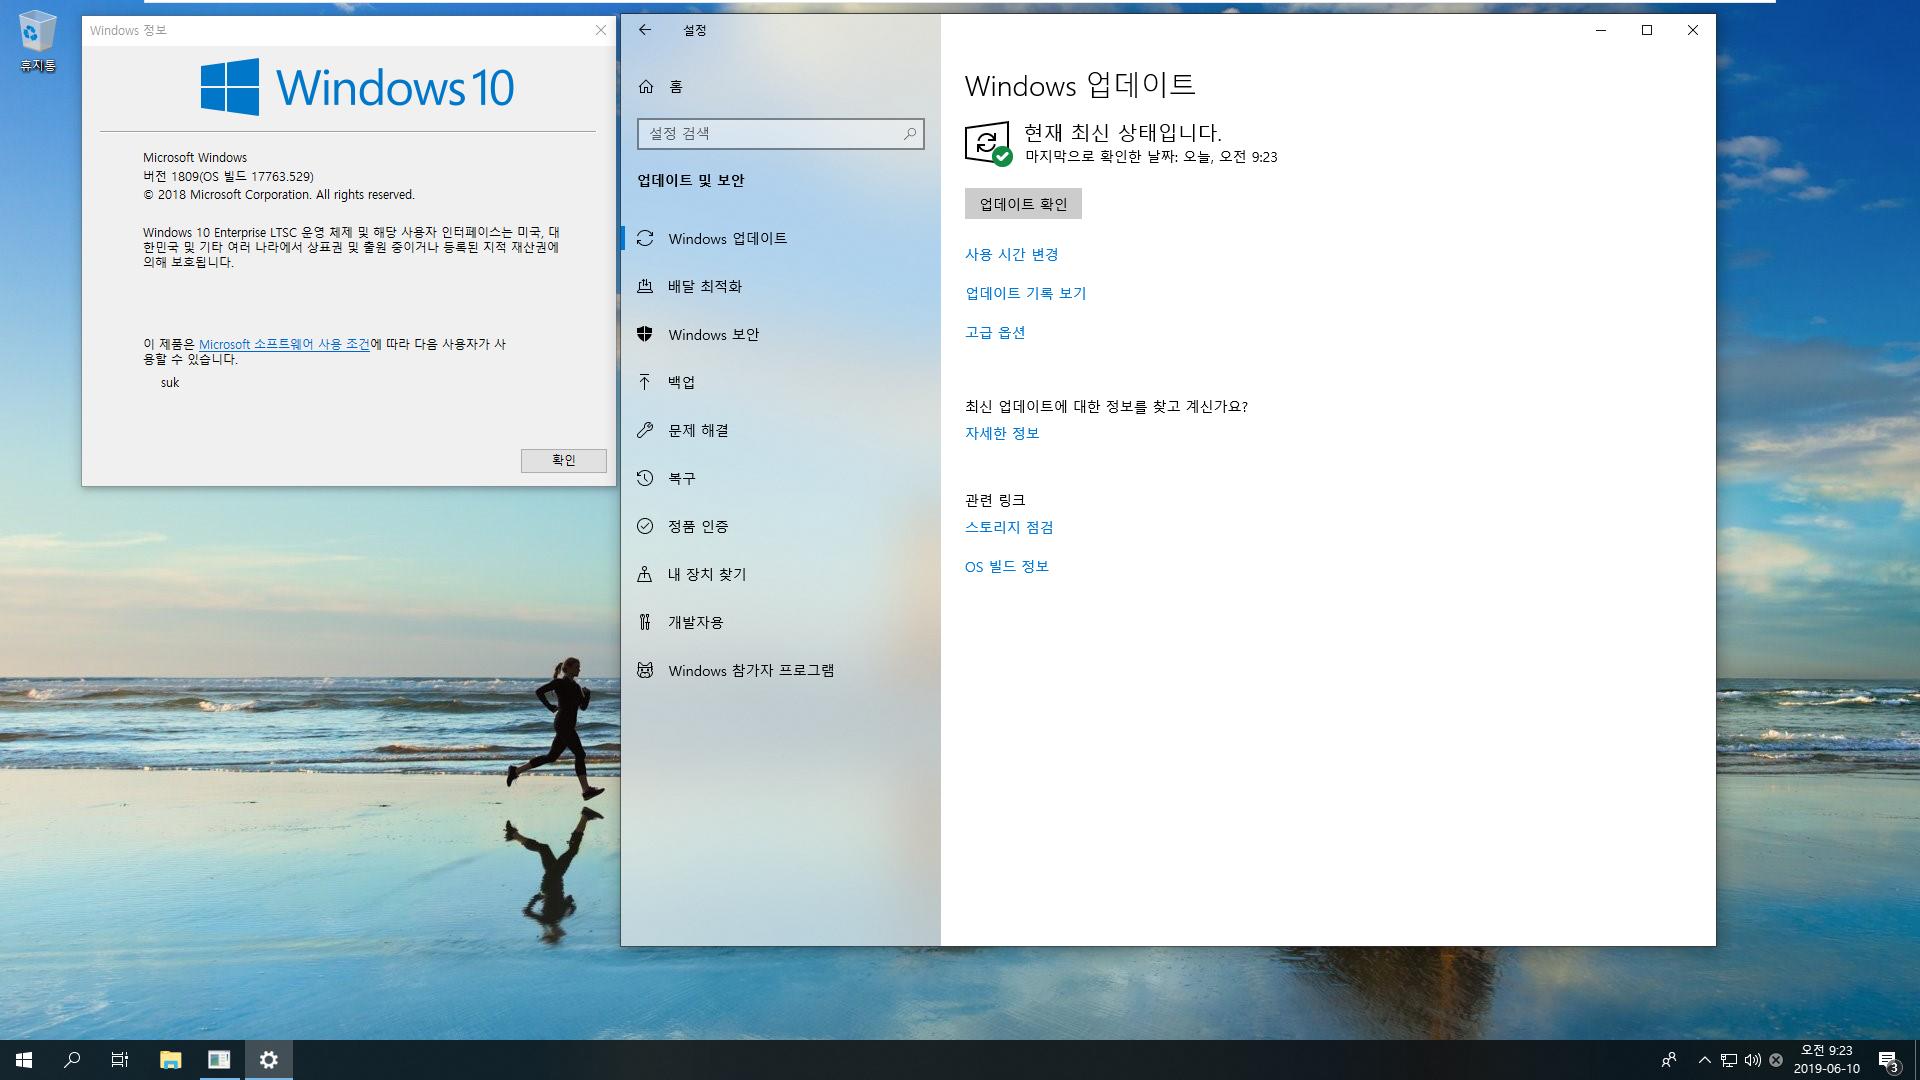 Windows 10 Enterprise LTSC [2019] - 버전 1809, 빌드 17763 - 버전 1903 기능 업데이트 테스트-지금 다운로드 및 설치를 클릭해야 기능 업데이트는 됩니다-그러나 LTSC는 역시 기능 업데이트가 되지 않네요. 기능 업데이트 나타난 것 자체가 버그 같습니다 2019-06-10_092342.png